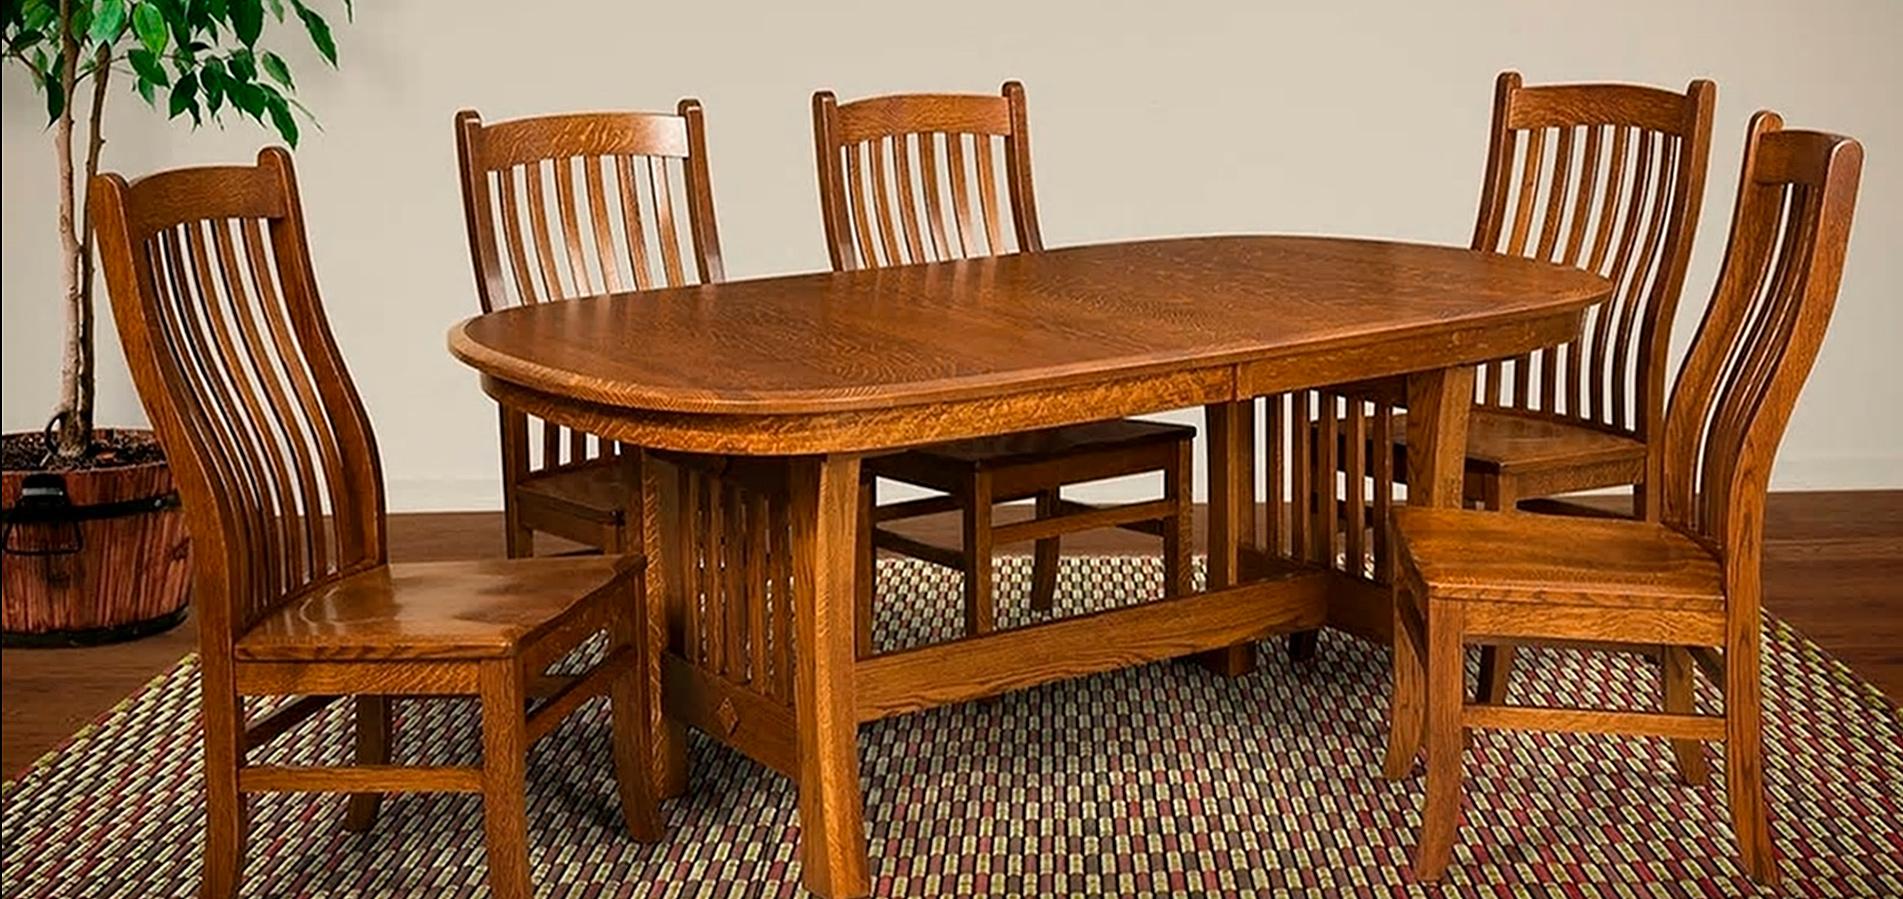 arts-and-crafts-dining-set-39006.jpg